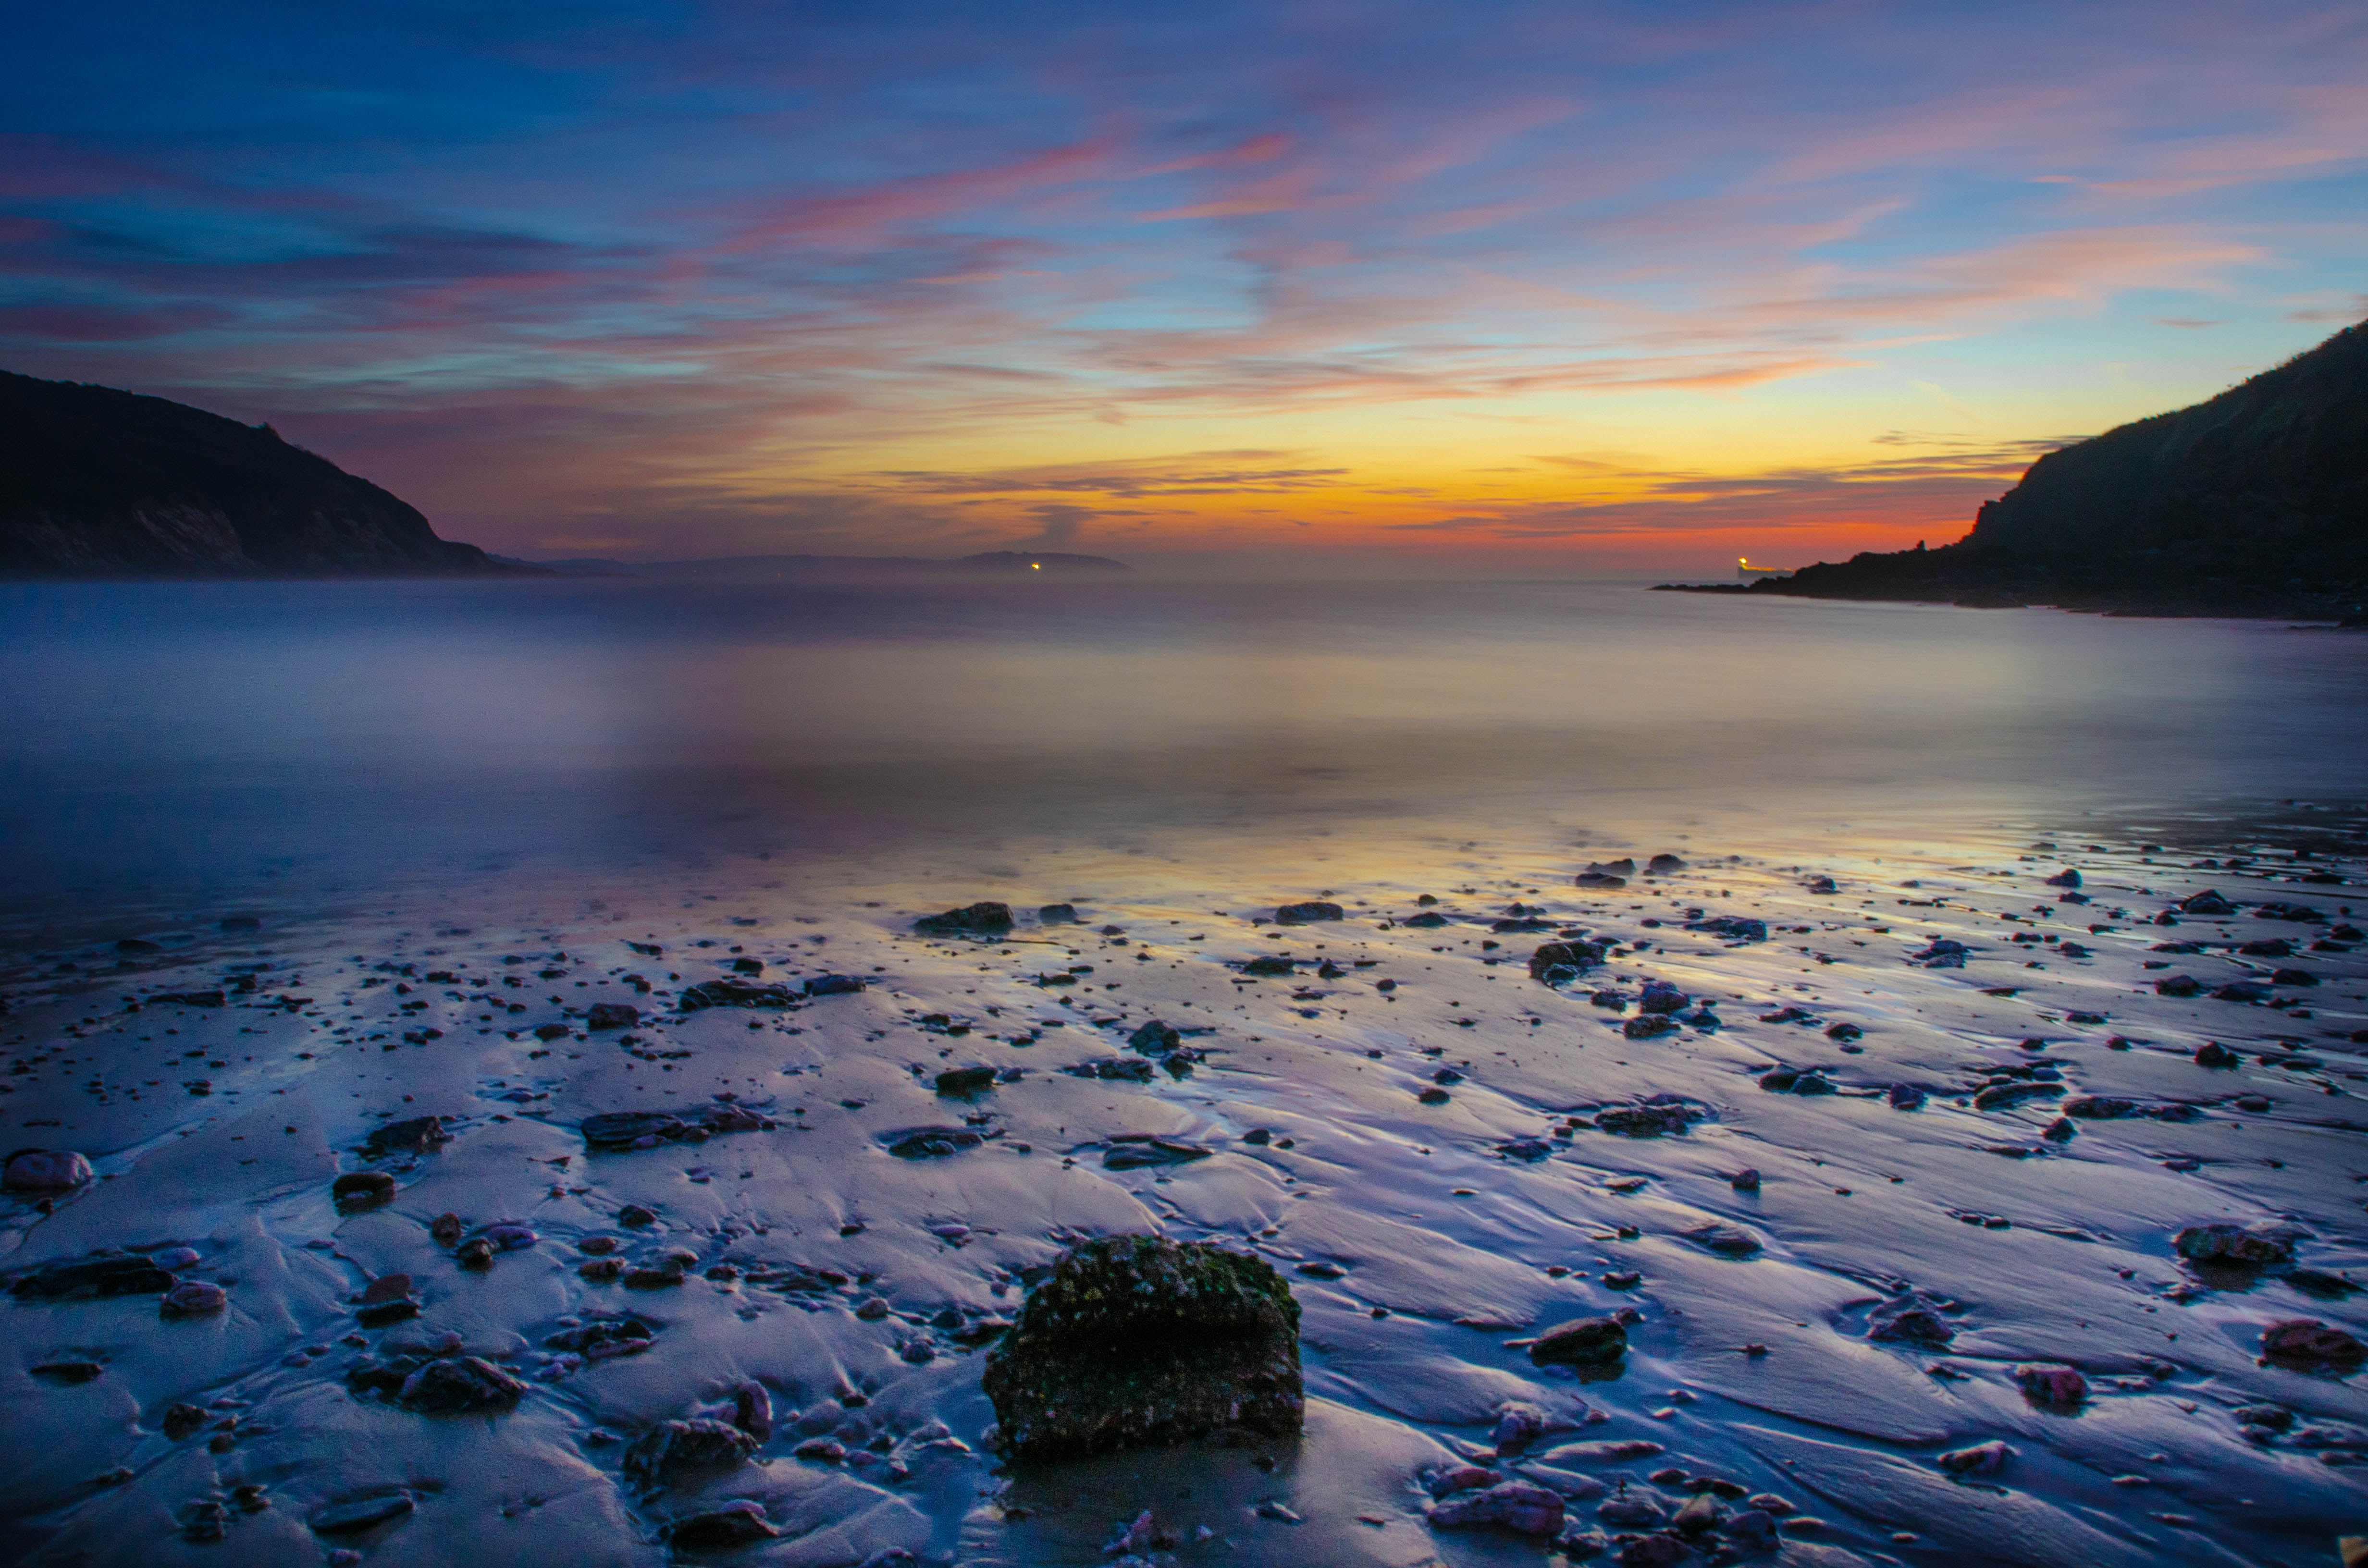 3840x2160 Beach Sea Shore 5k 4k HD 4k Wallpapers, Images ...